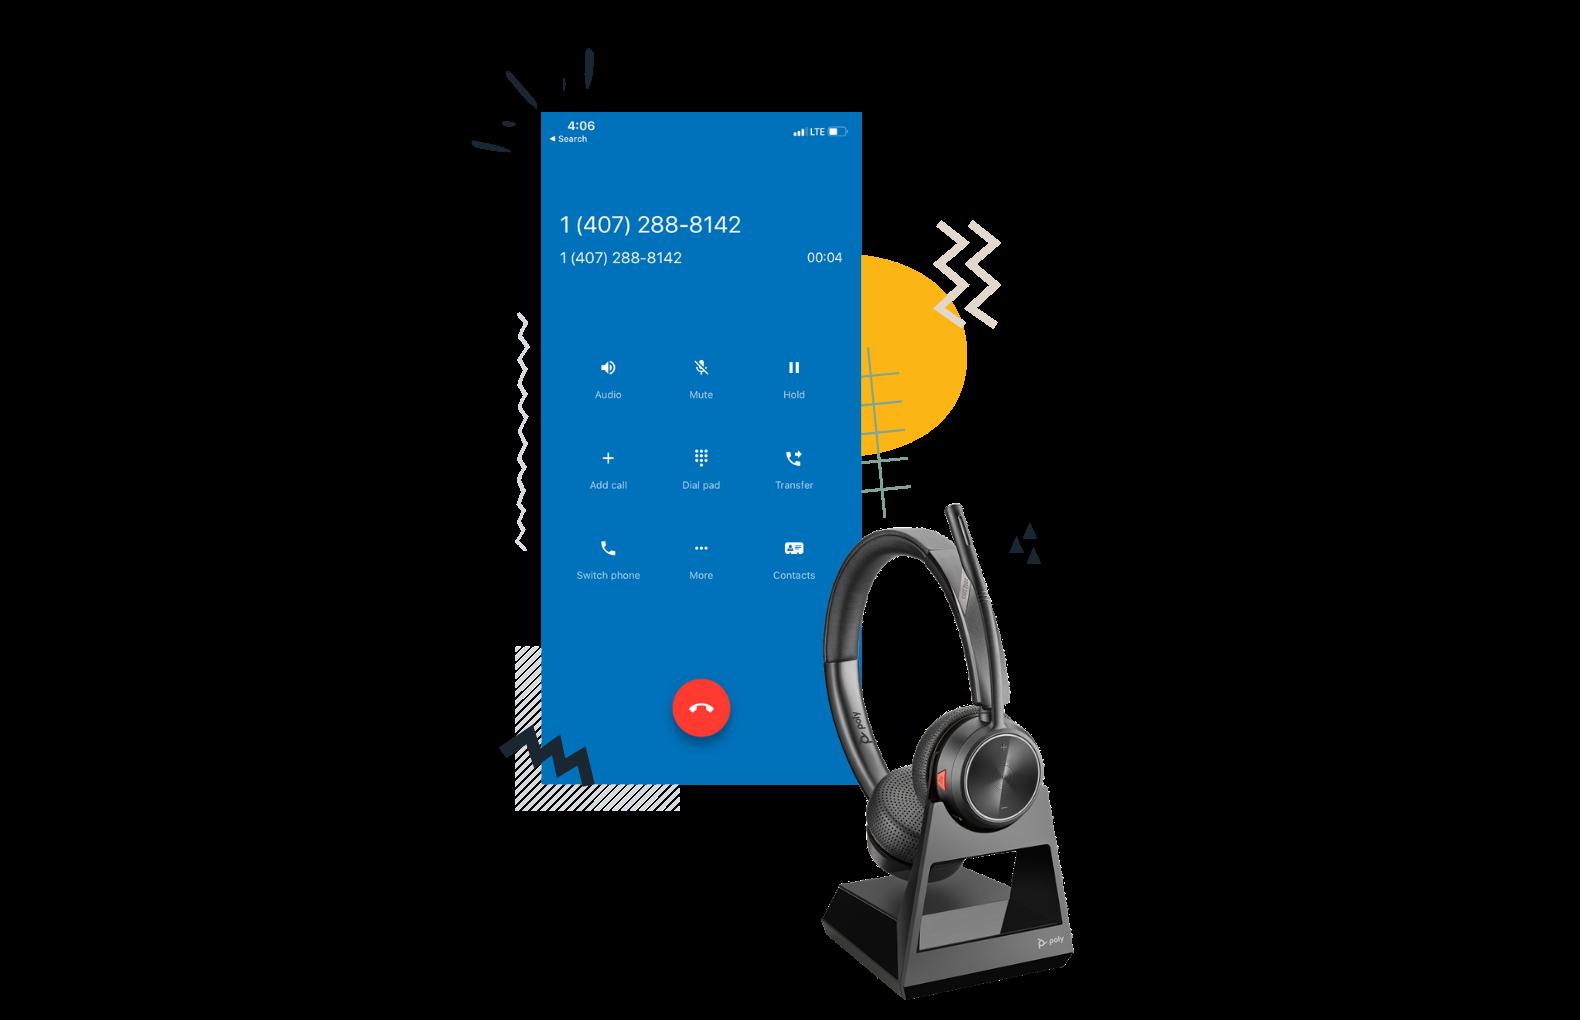 Voxtell Contact Center App